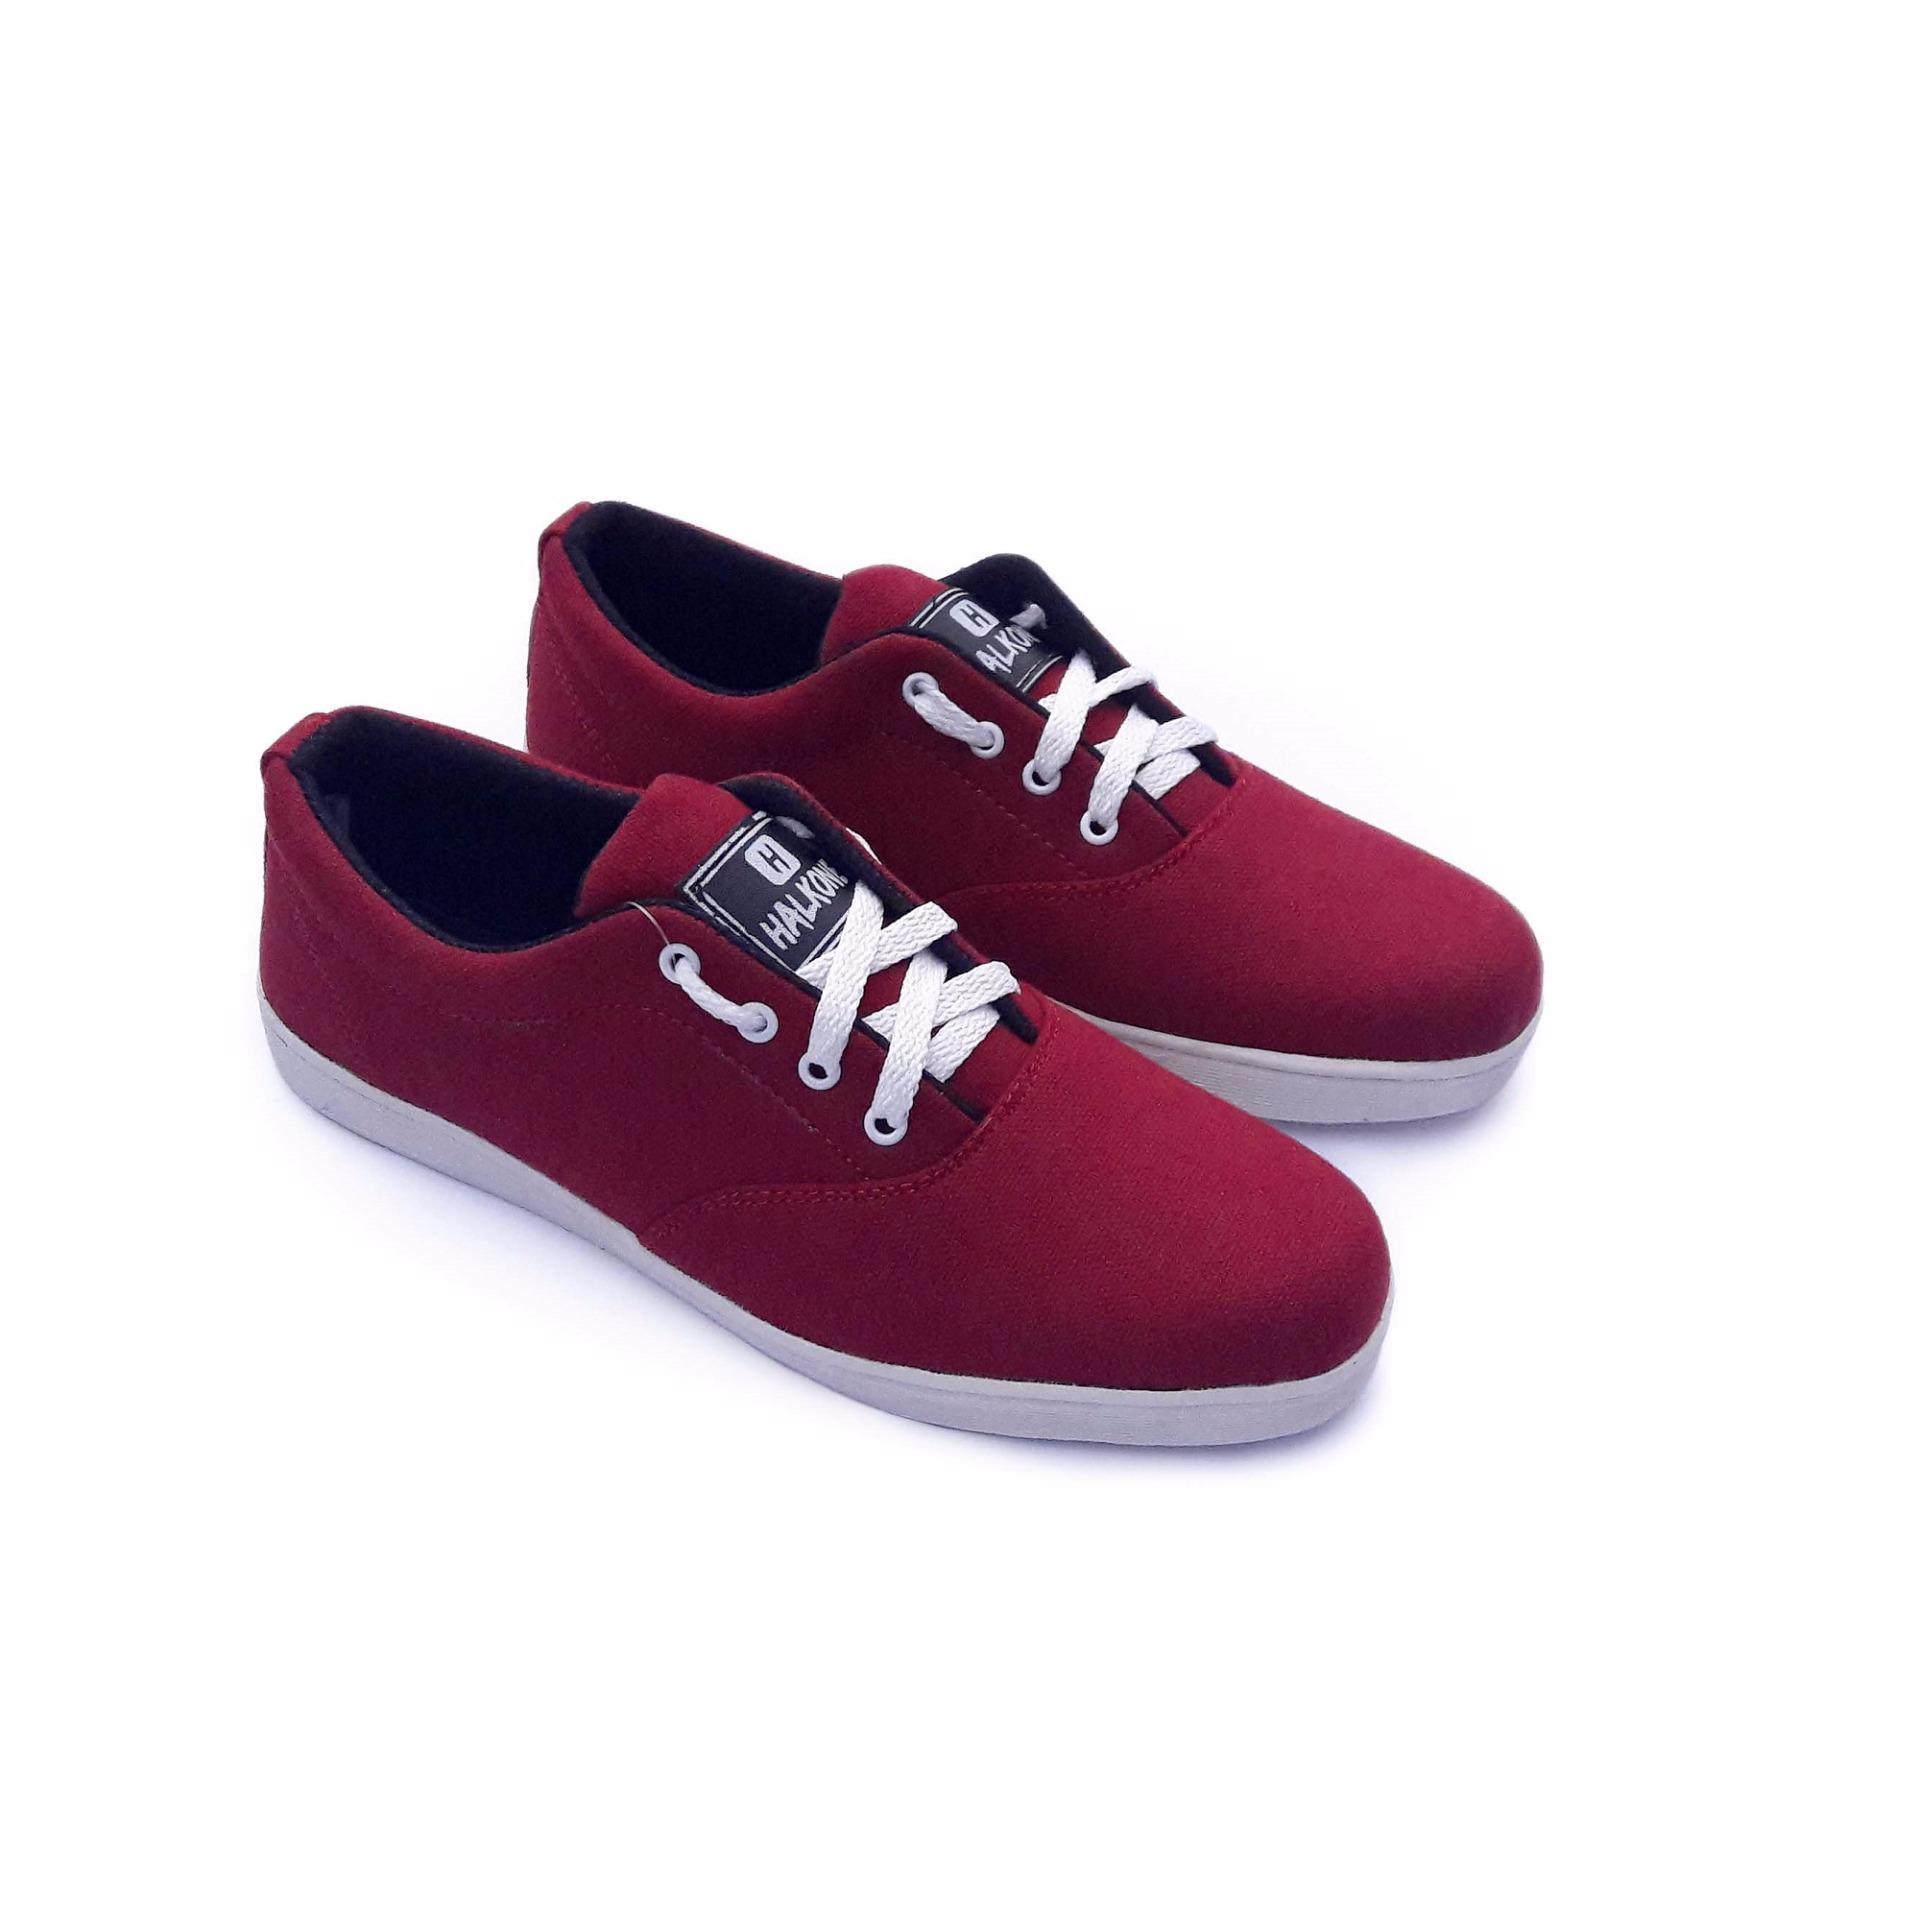 Spesifikasi Halkoneku Halkone Ws Sneaker Pria Paling Bagus